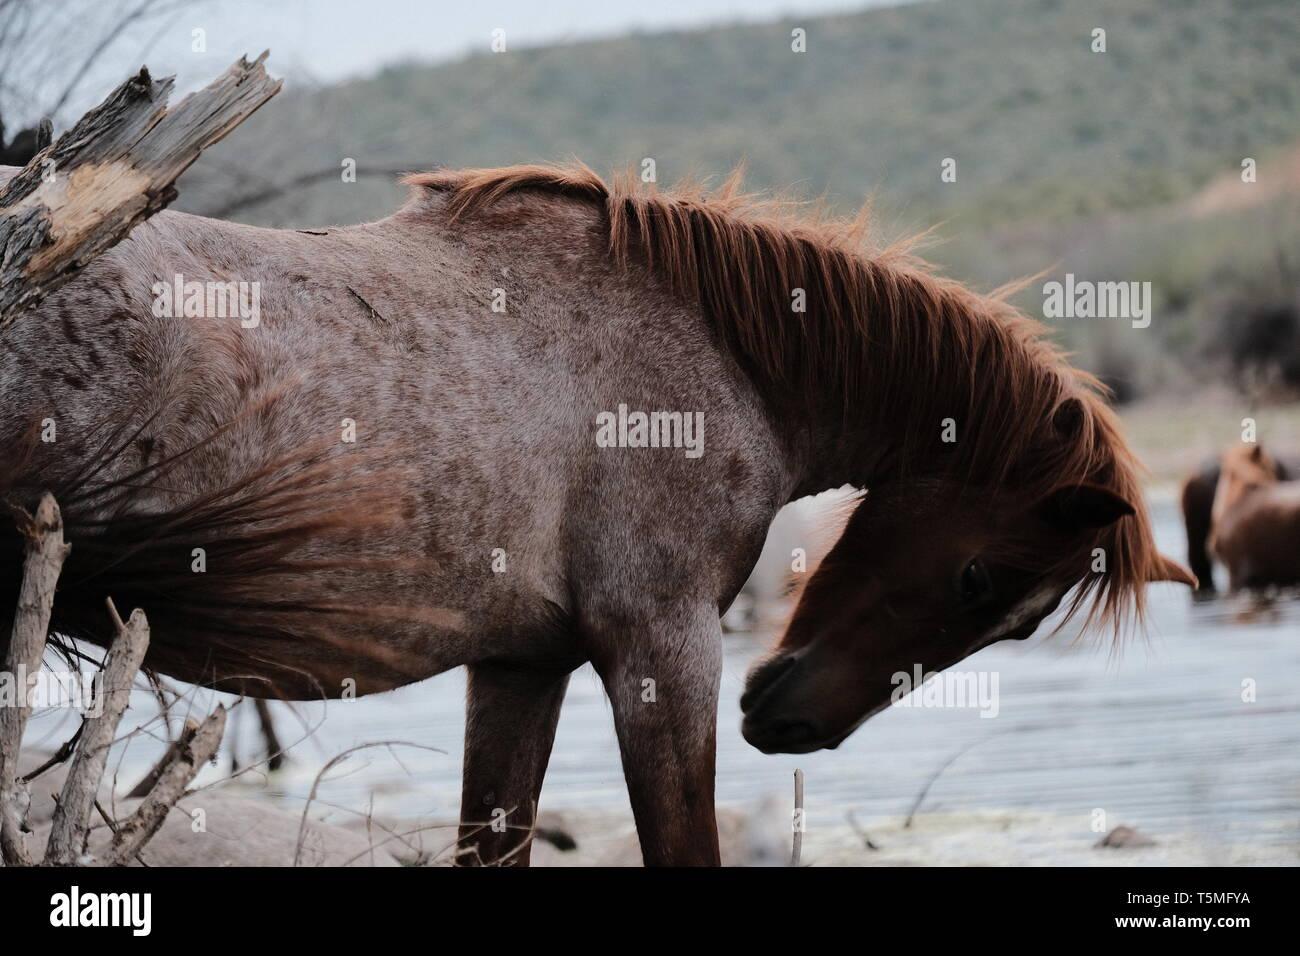 Wild horses at the salt river in Arizona Stock Photo